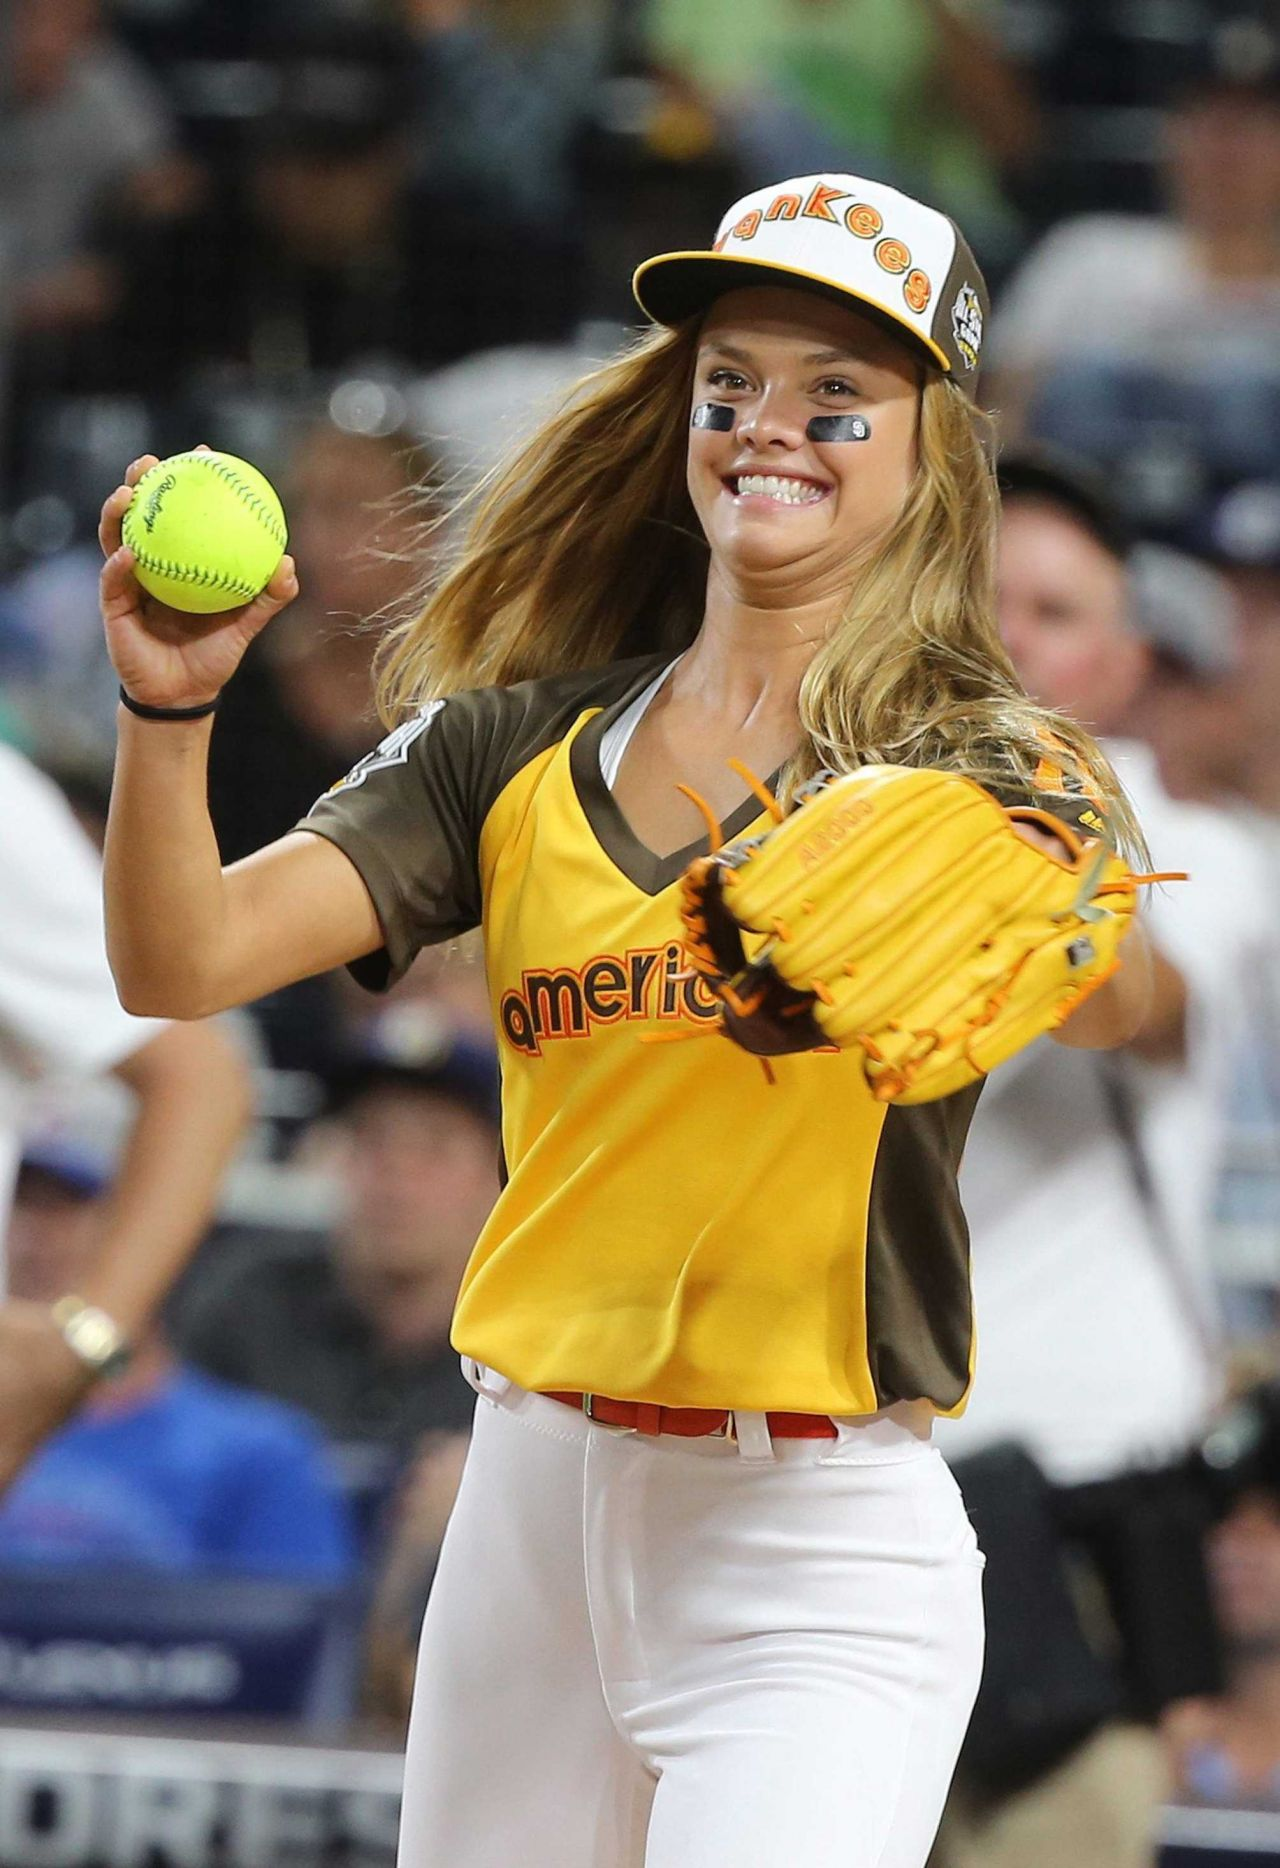 All star legends celebrity softball game